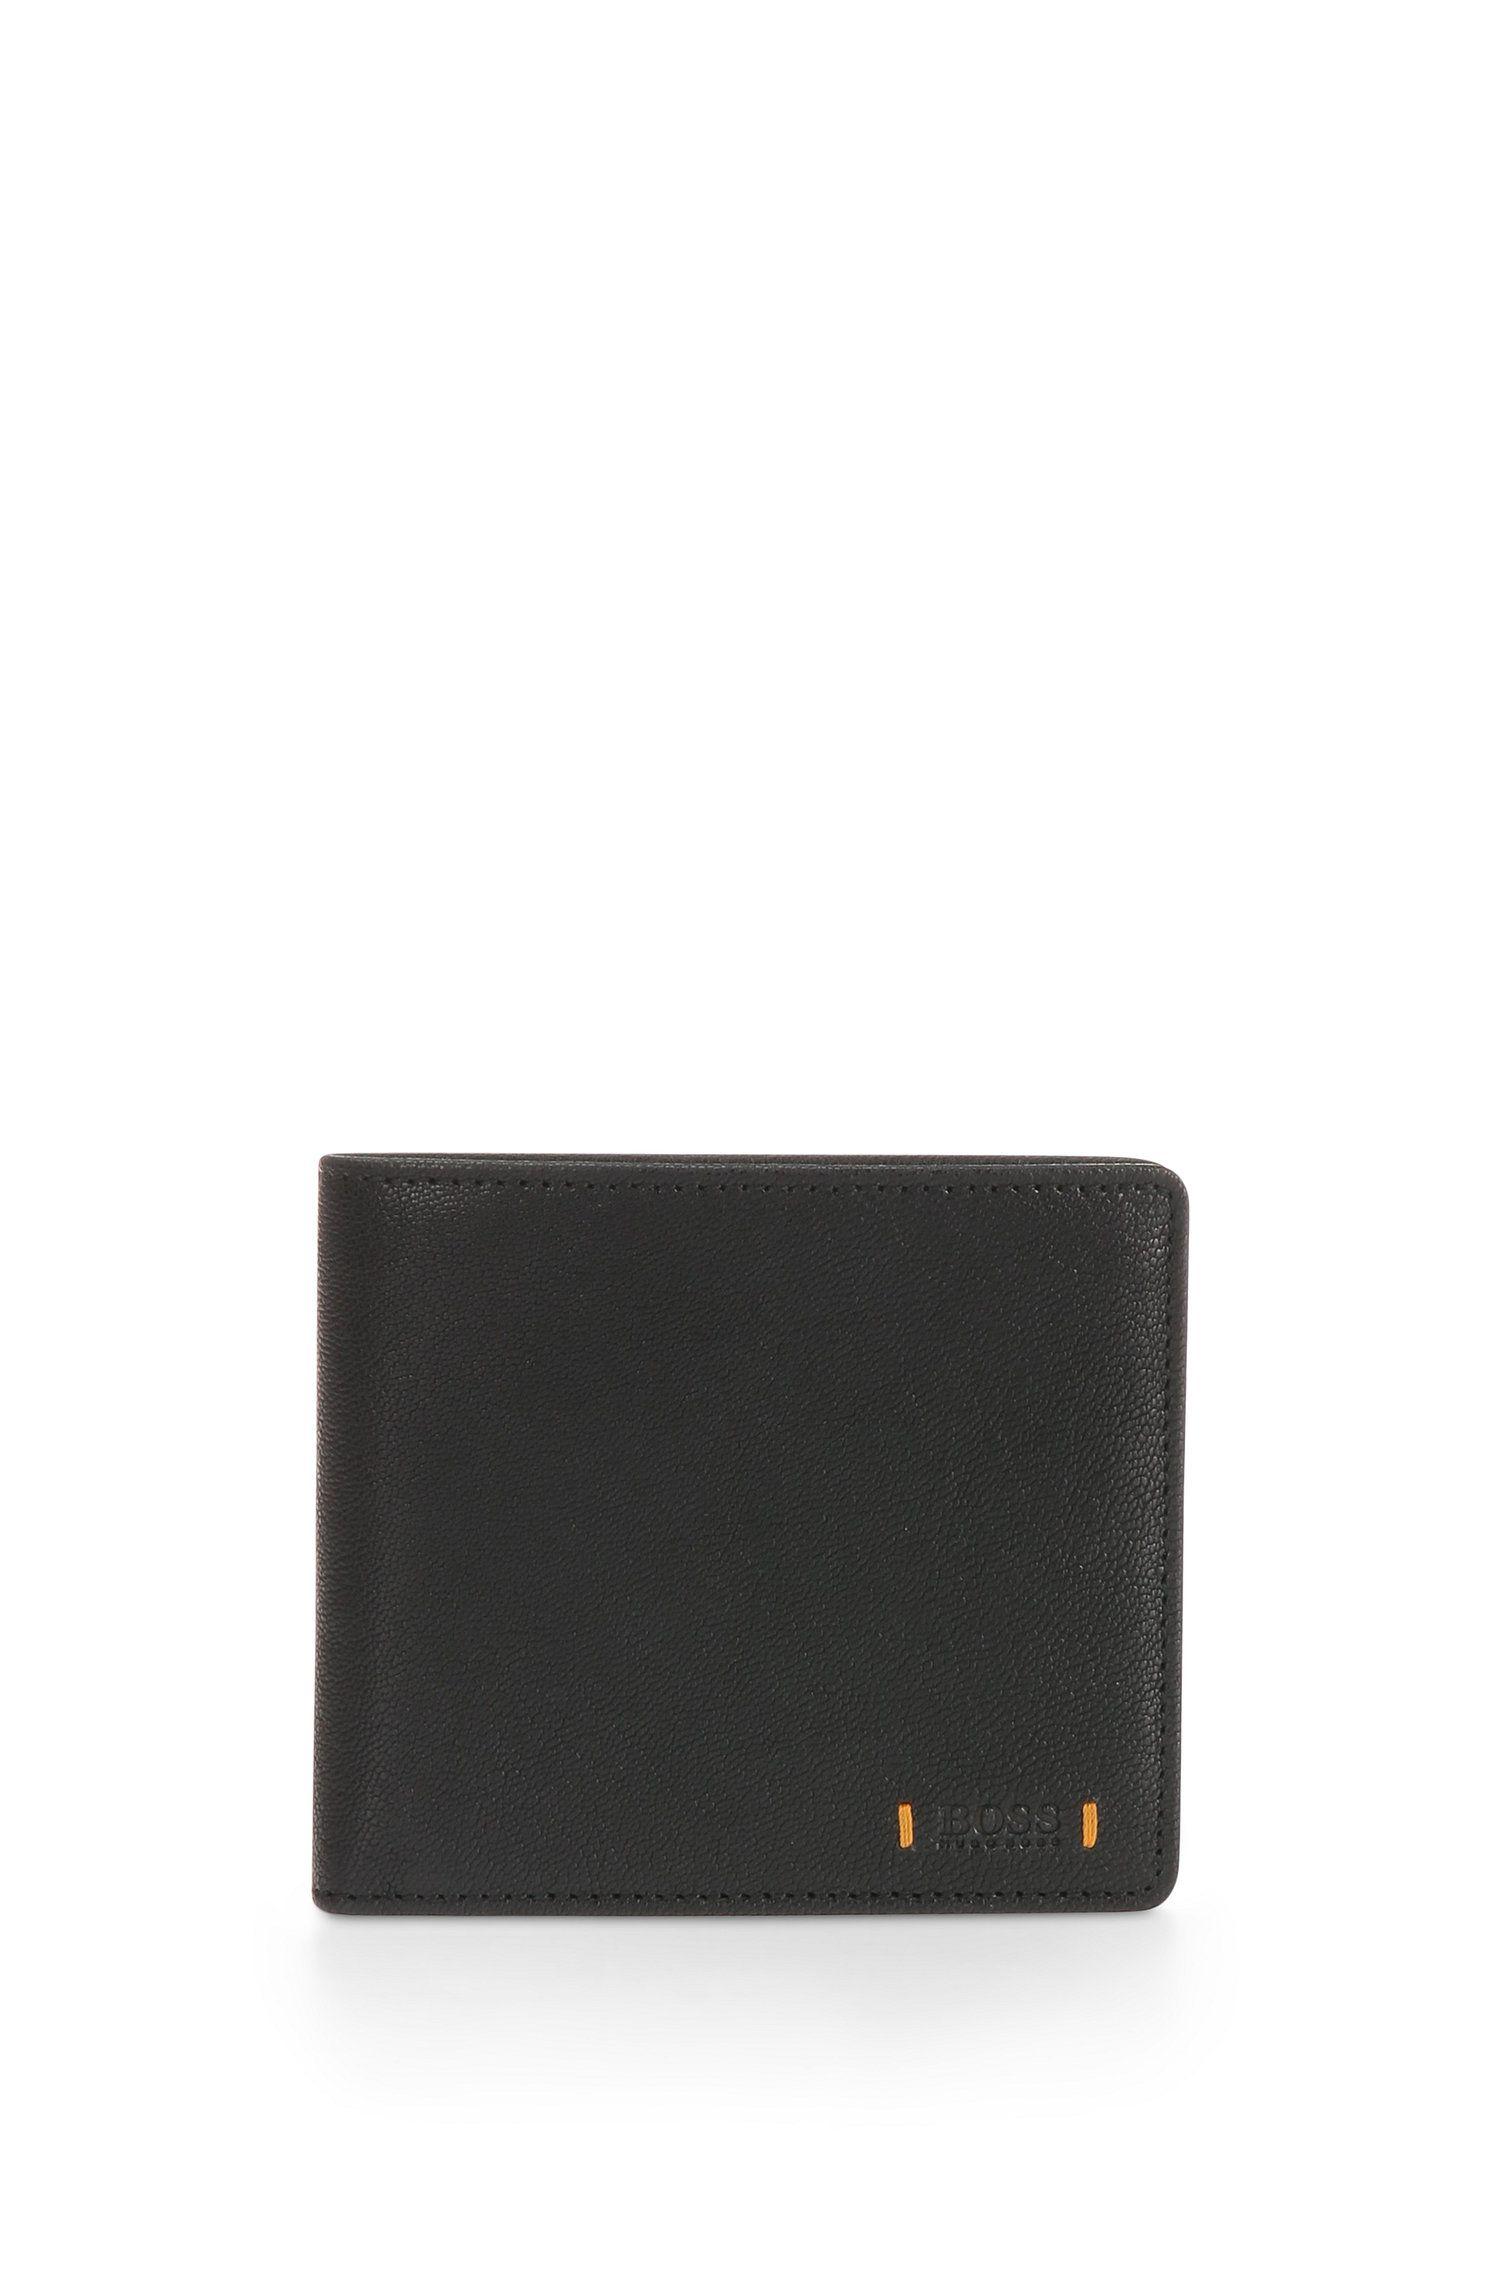 Portemonnaie aus Leder zum Aufklappen: ´Streetline_8 cc`